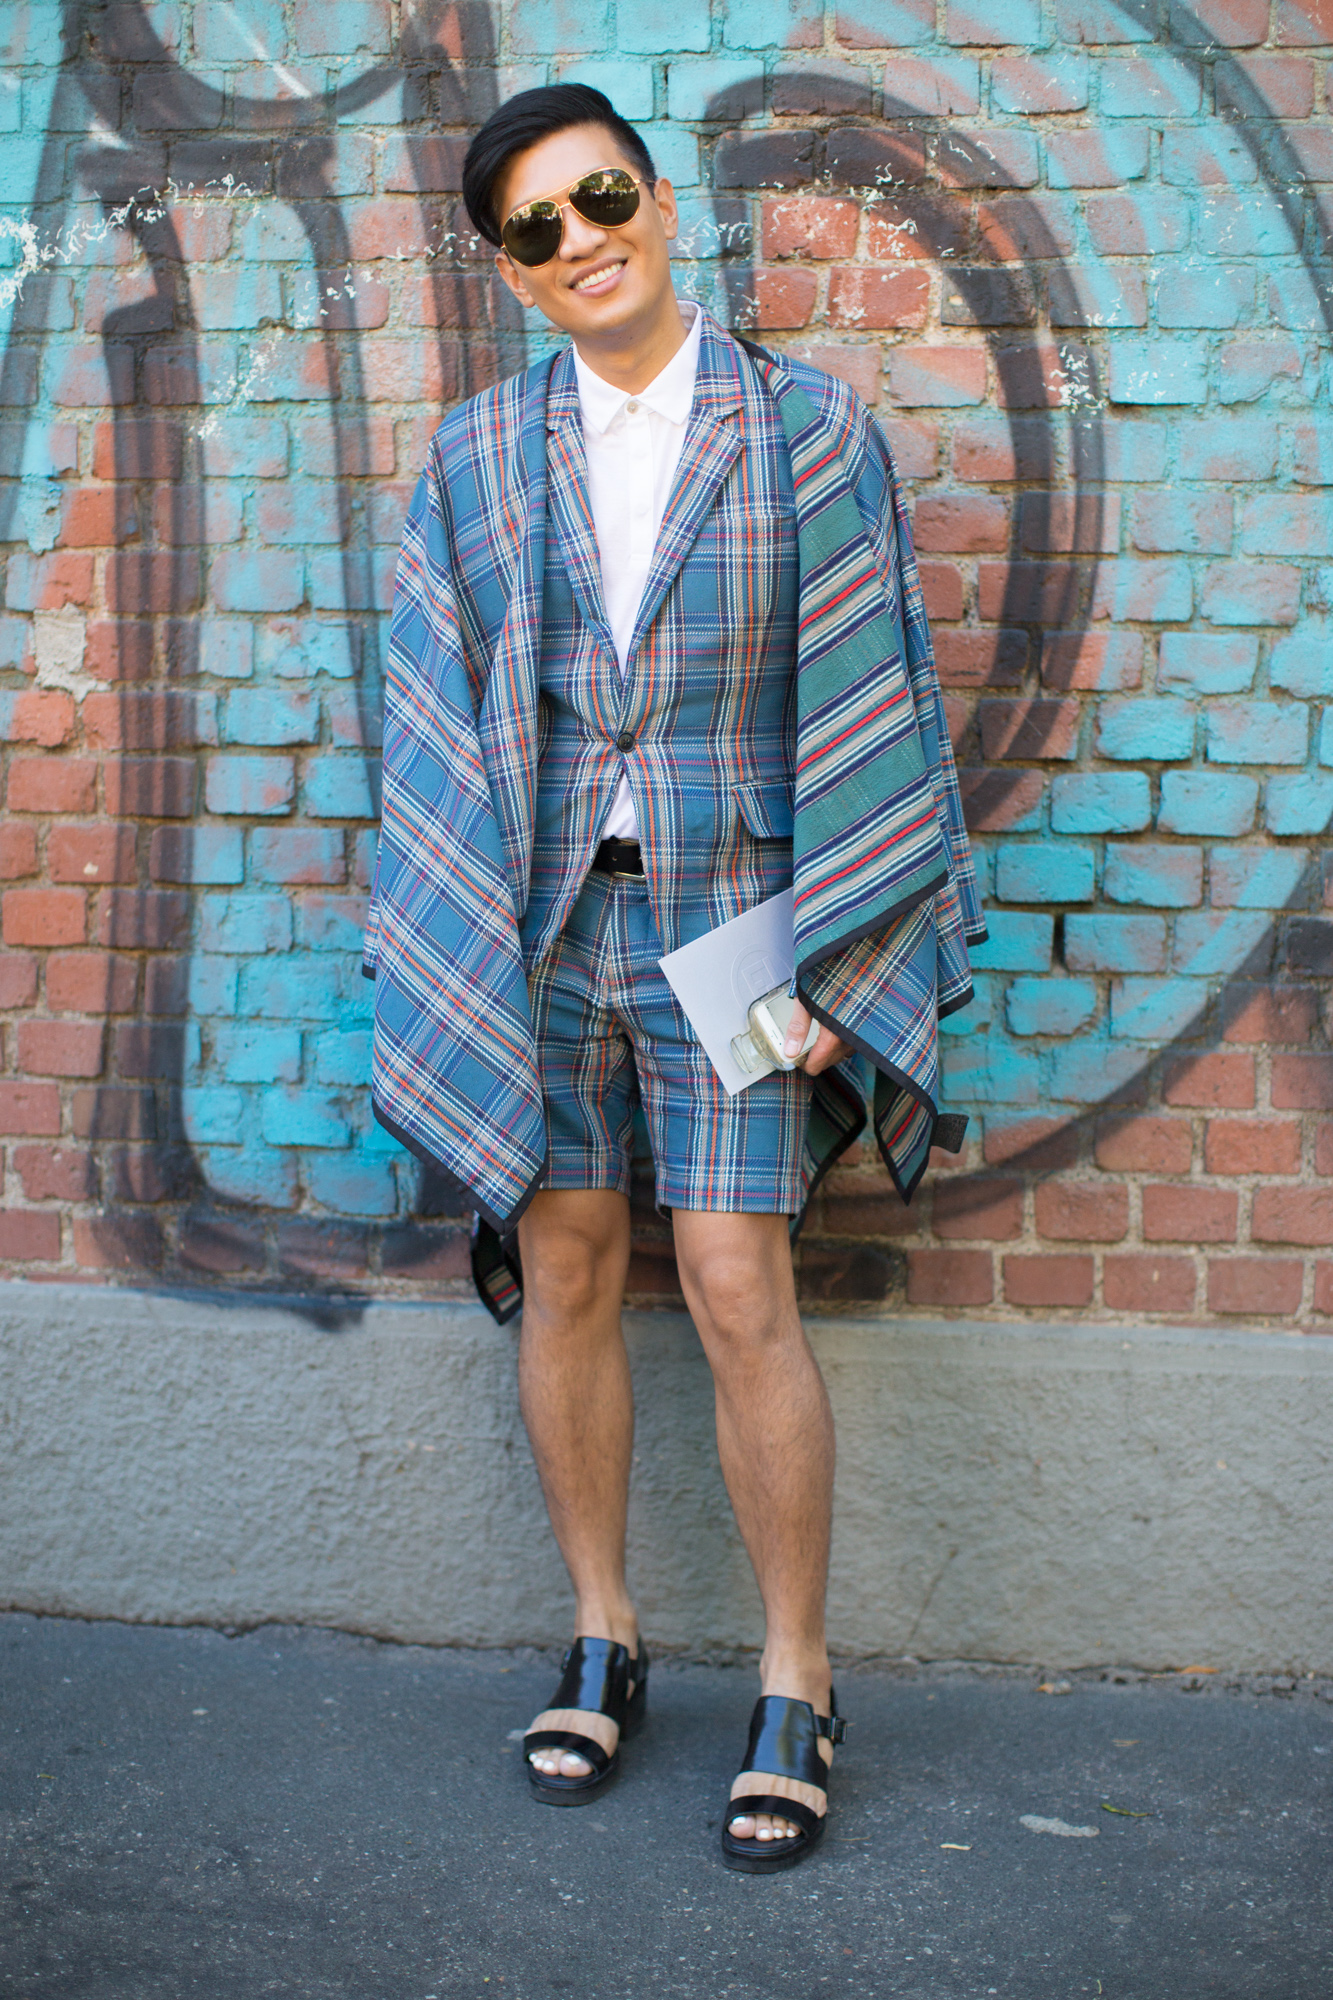 Street Style - Bryanboy